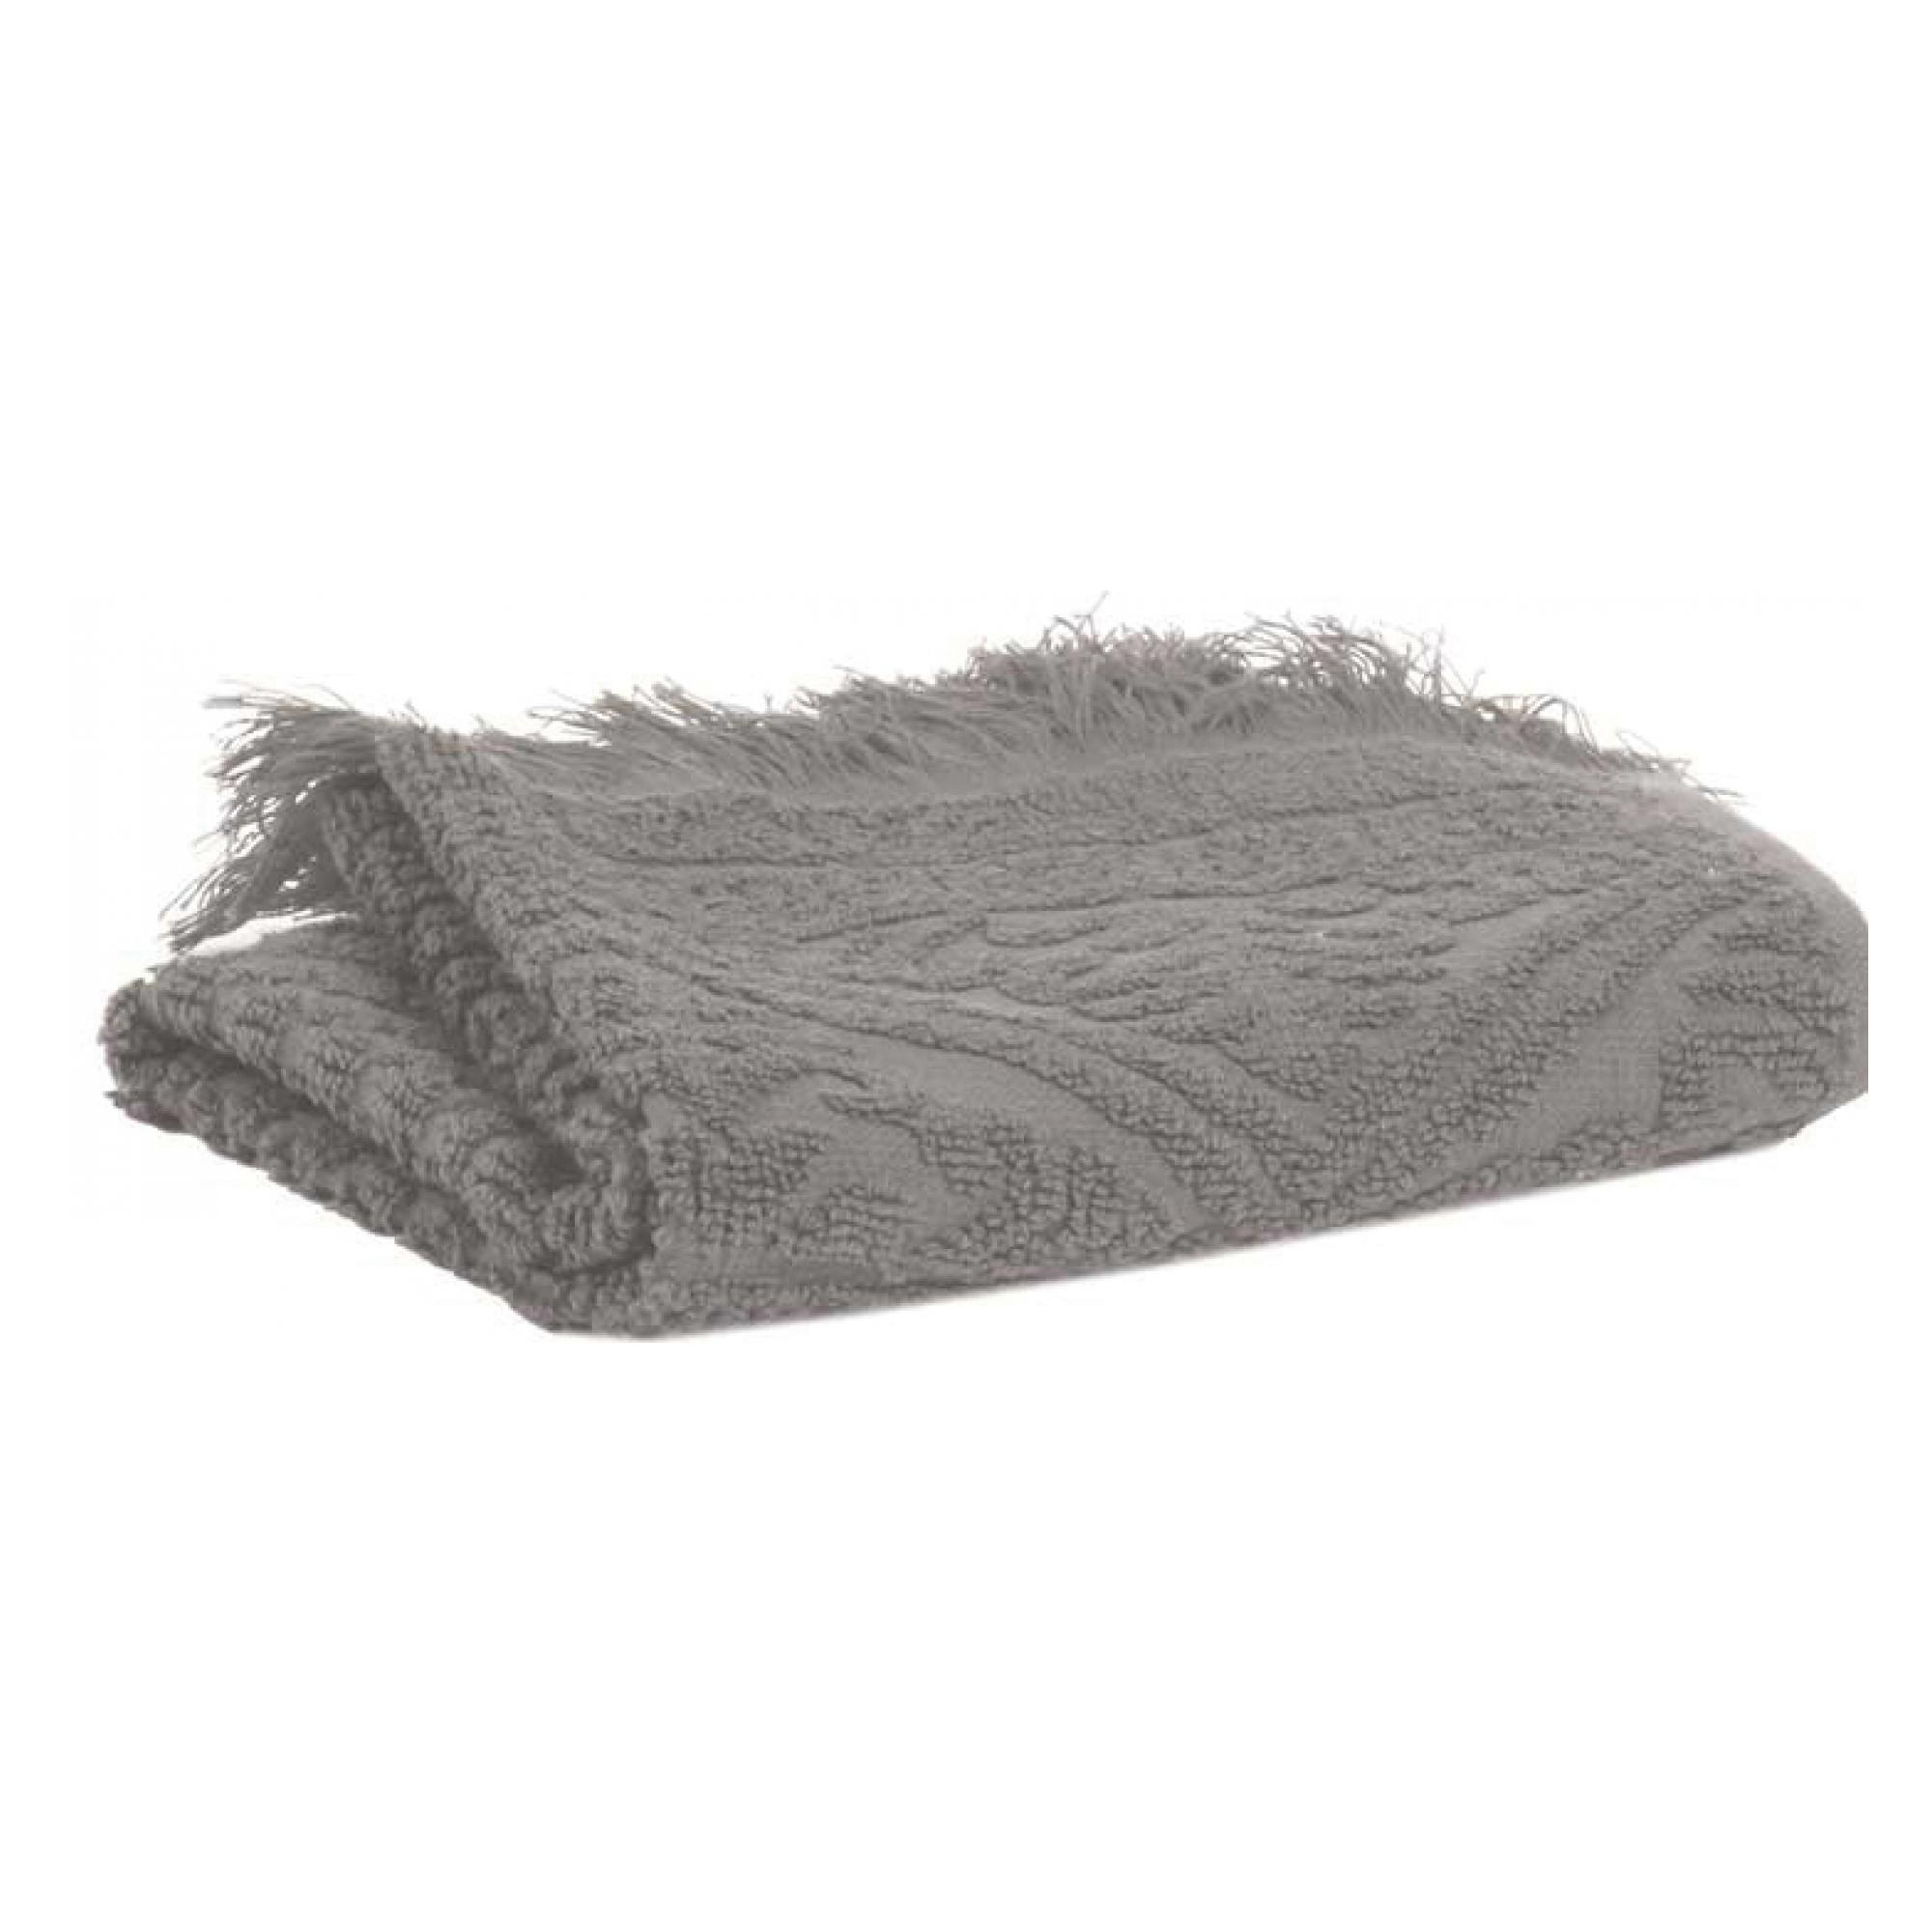 Drap de douche en coton orage 70 x 140